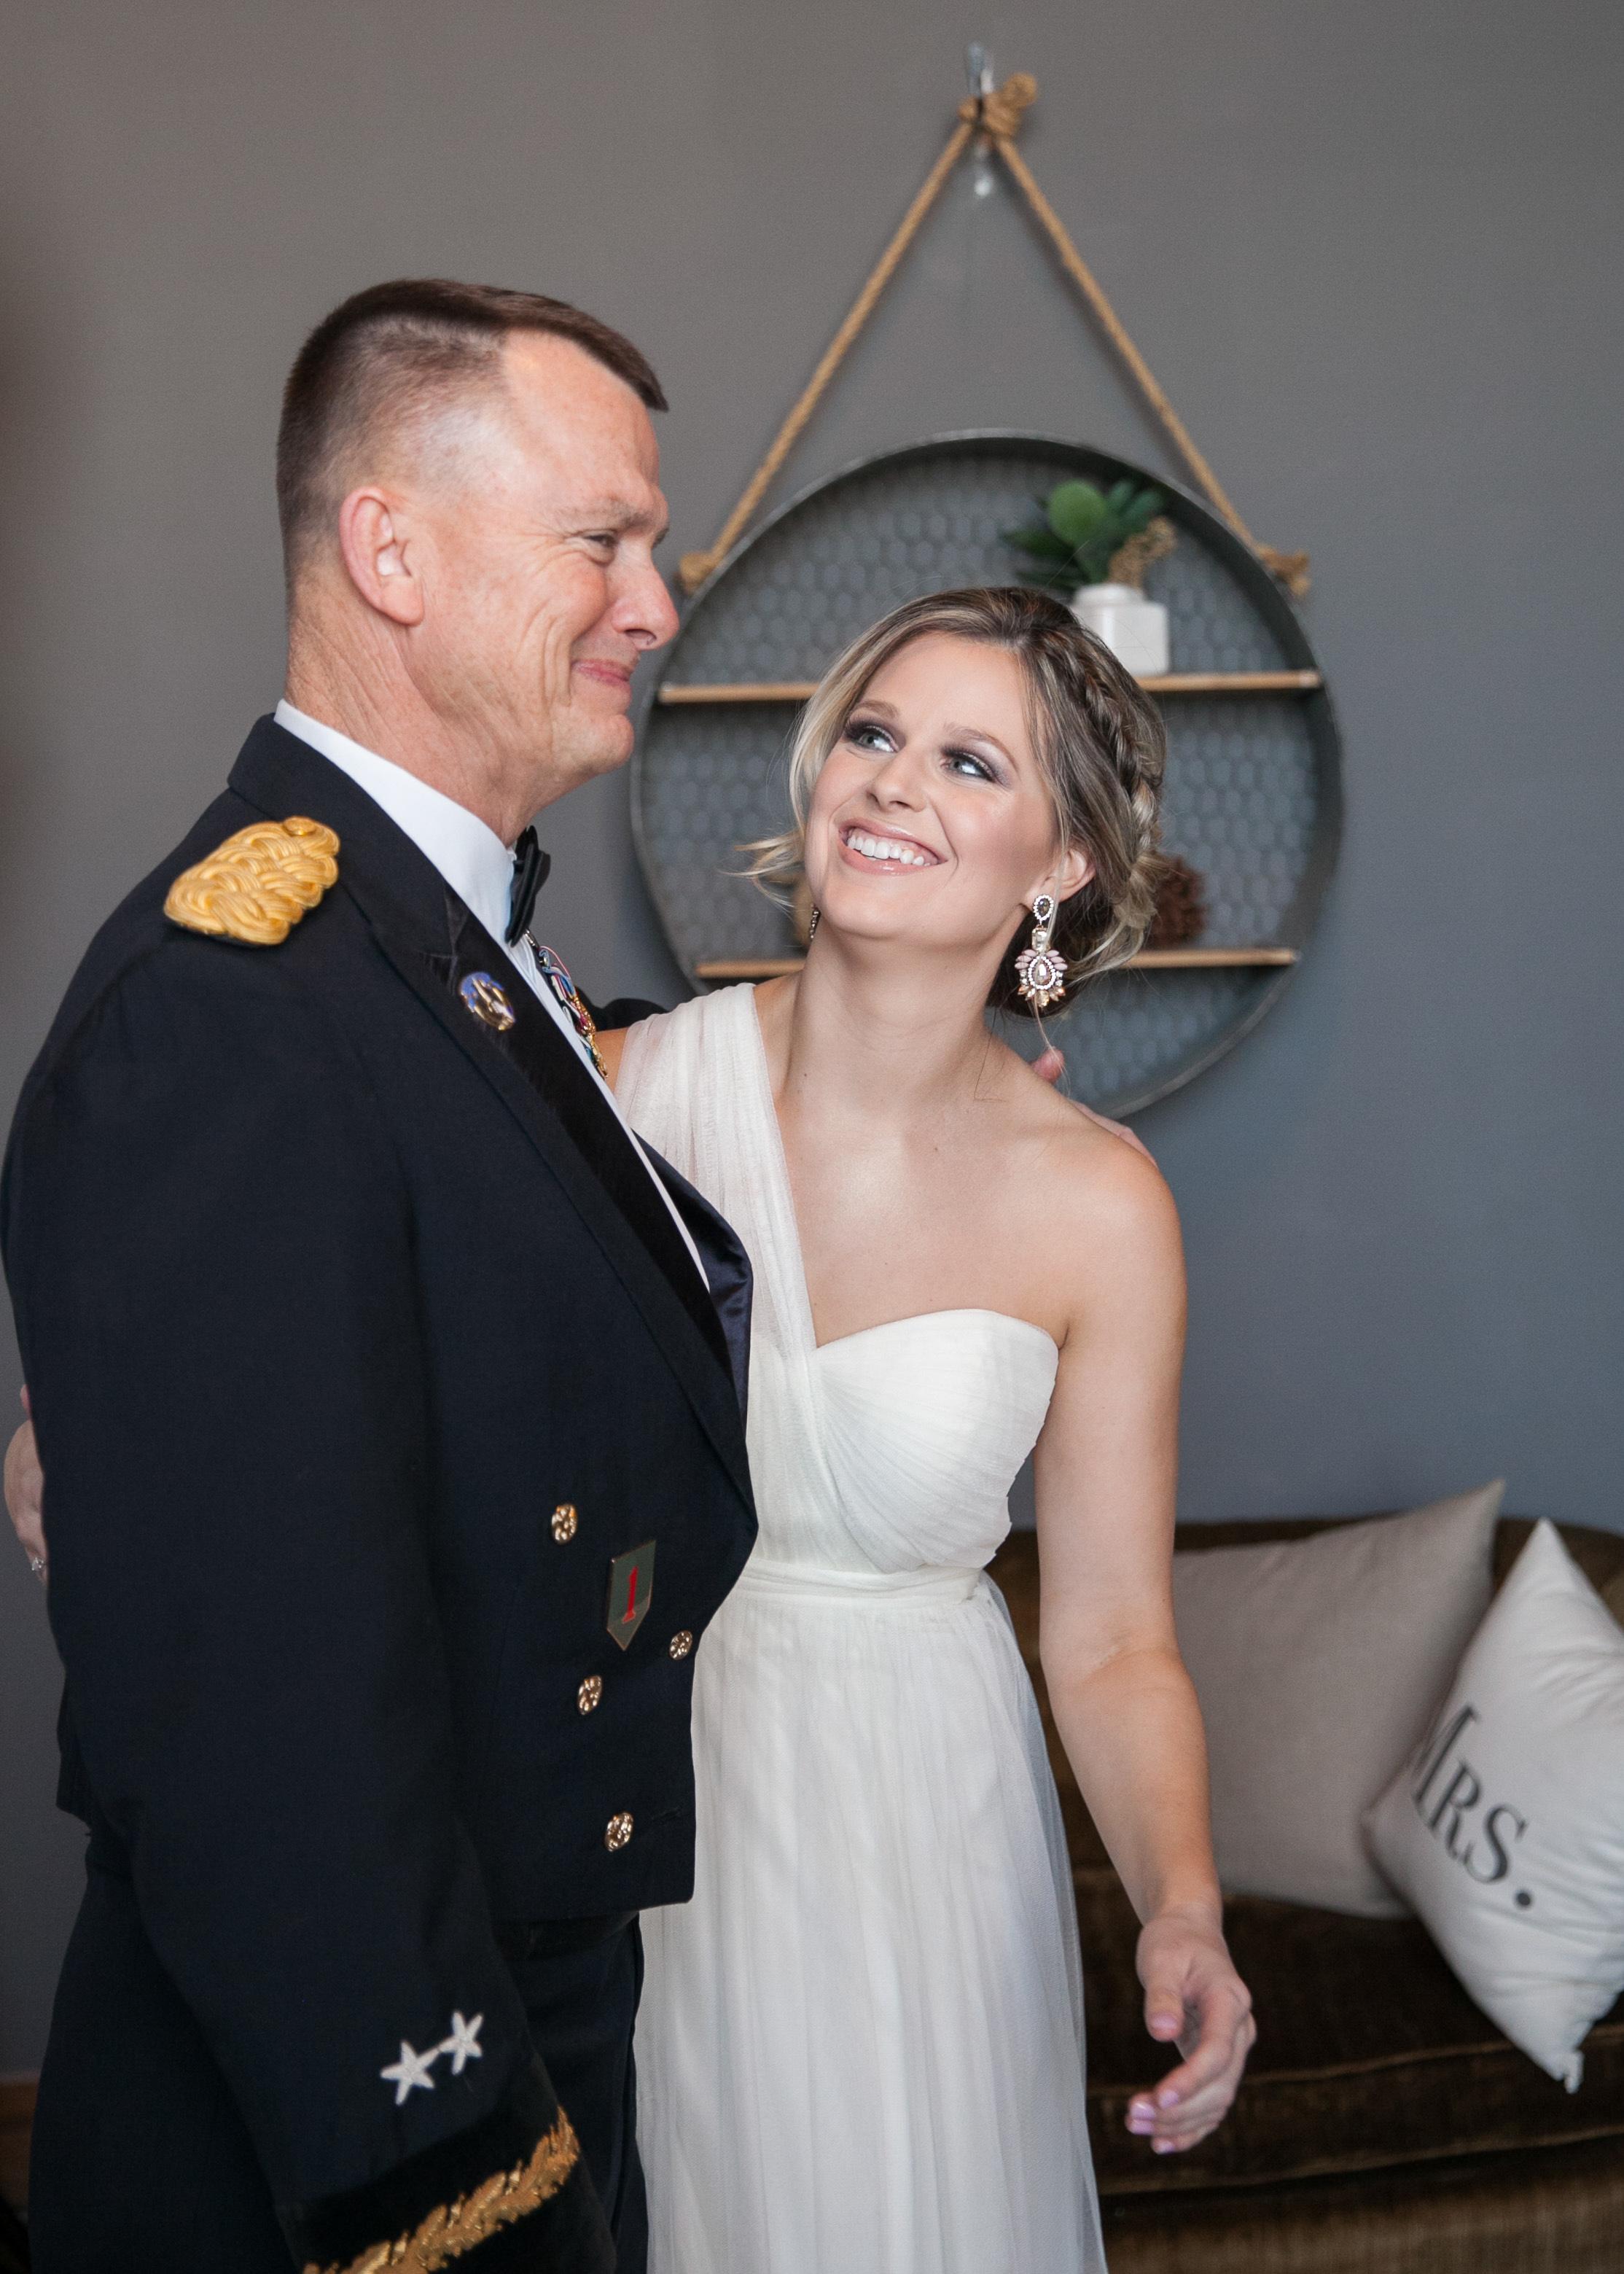 Kansas_City_Small_Wedding_Venue_Elope_Intimate_Ceremony_Budget_Affordable_131A&J.jpg